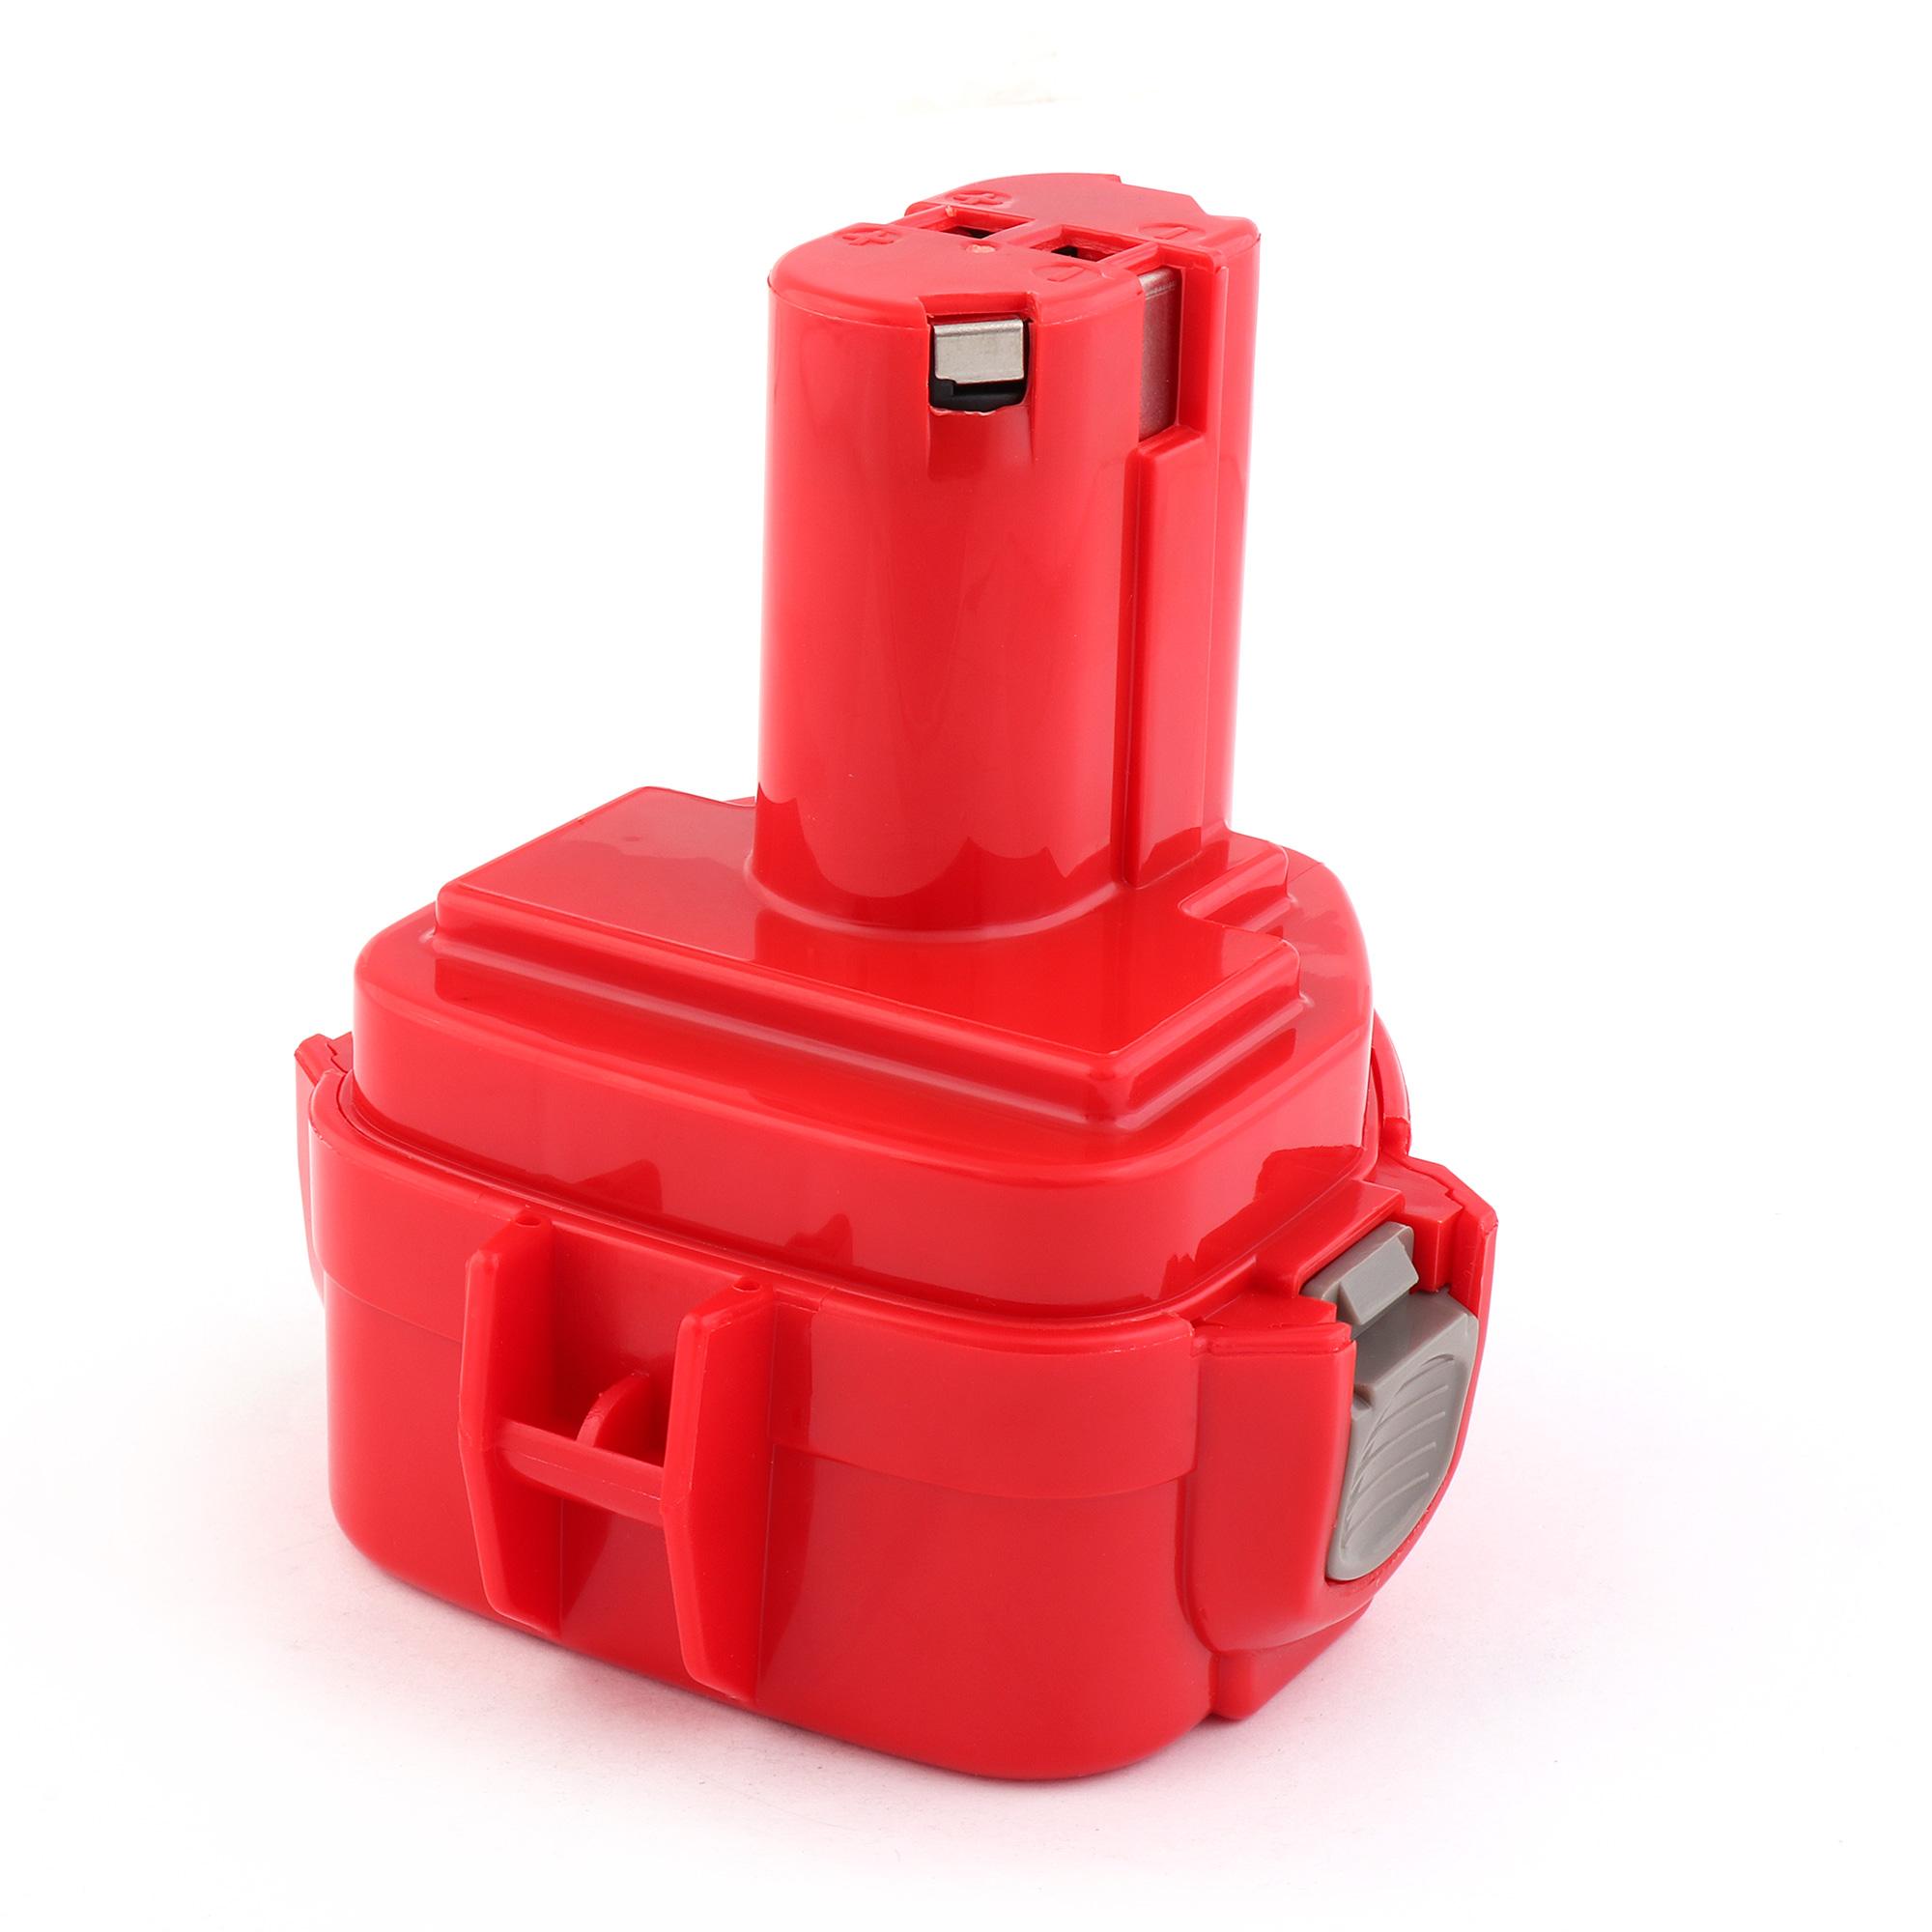 Аккумулятор для инструмента TopON TOP-PTGD-MAK-12-1.3 pa12 pa12m